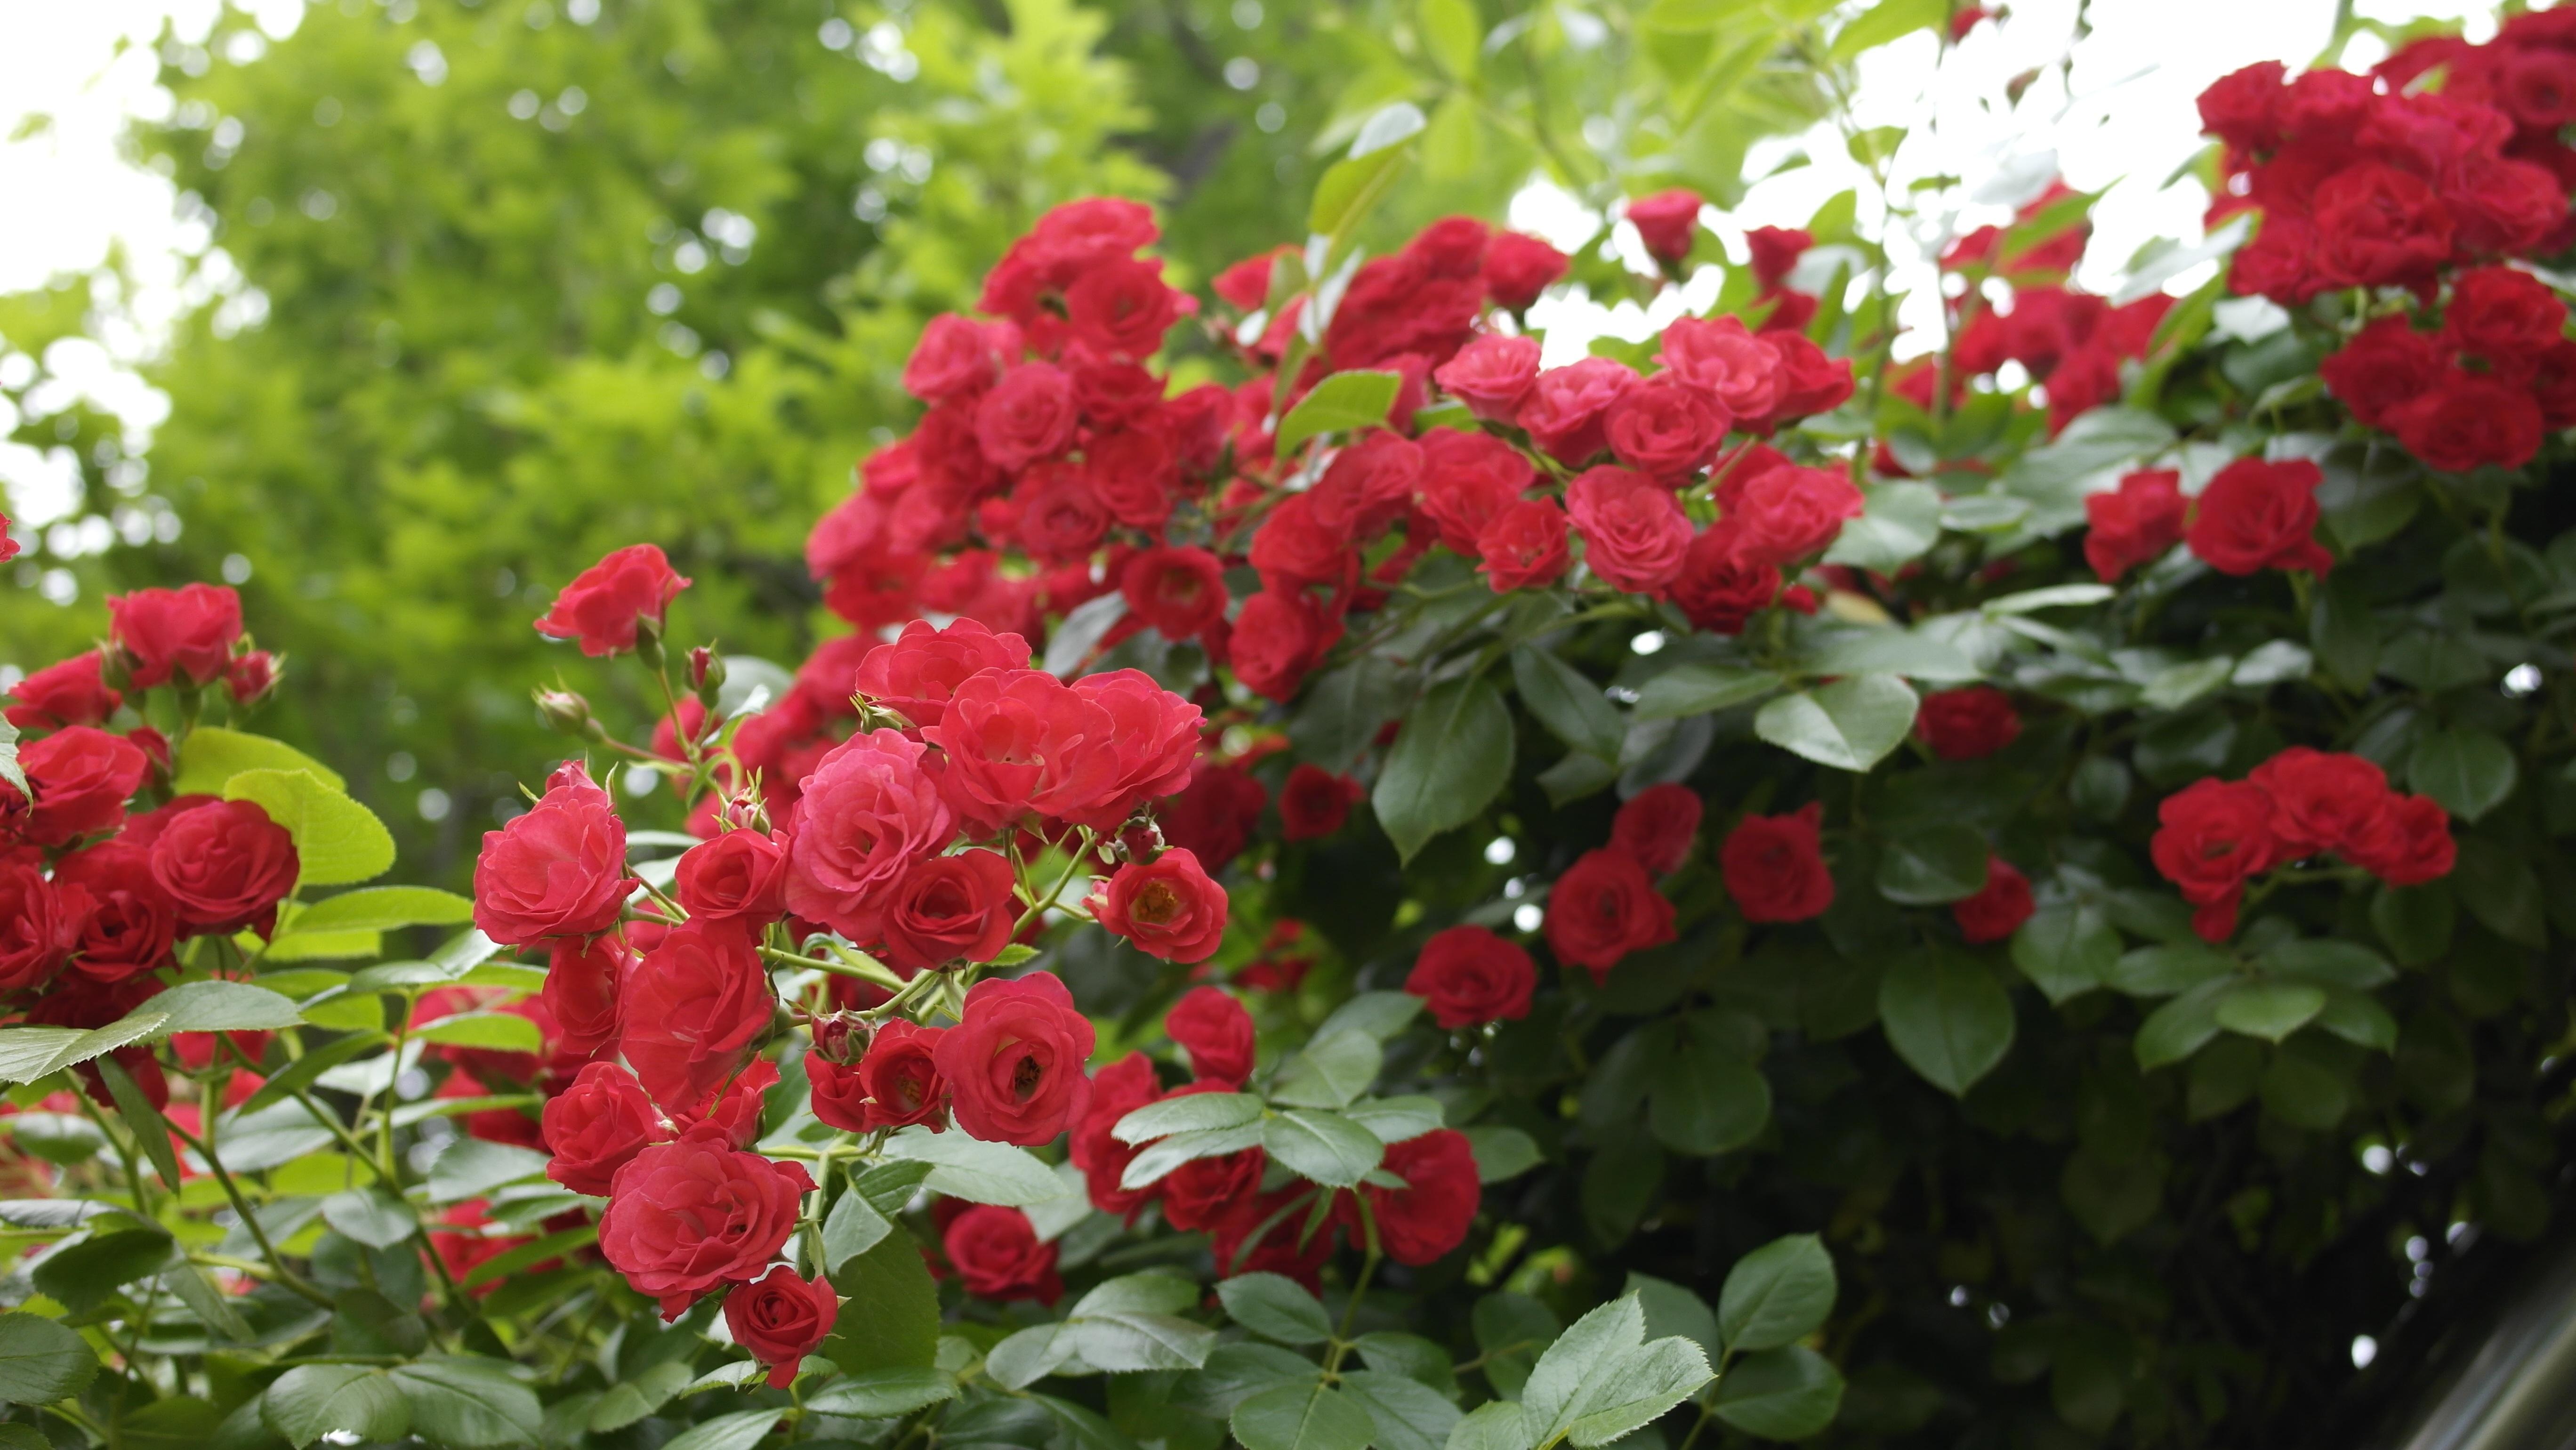 Fotos gratis naturaleza flor verano rojo plantas for Pianta rosa